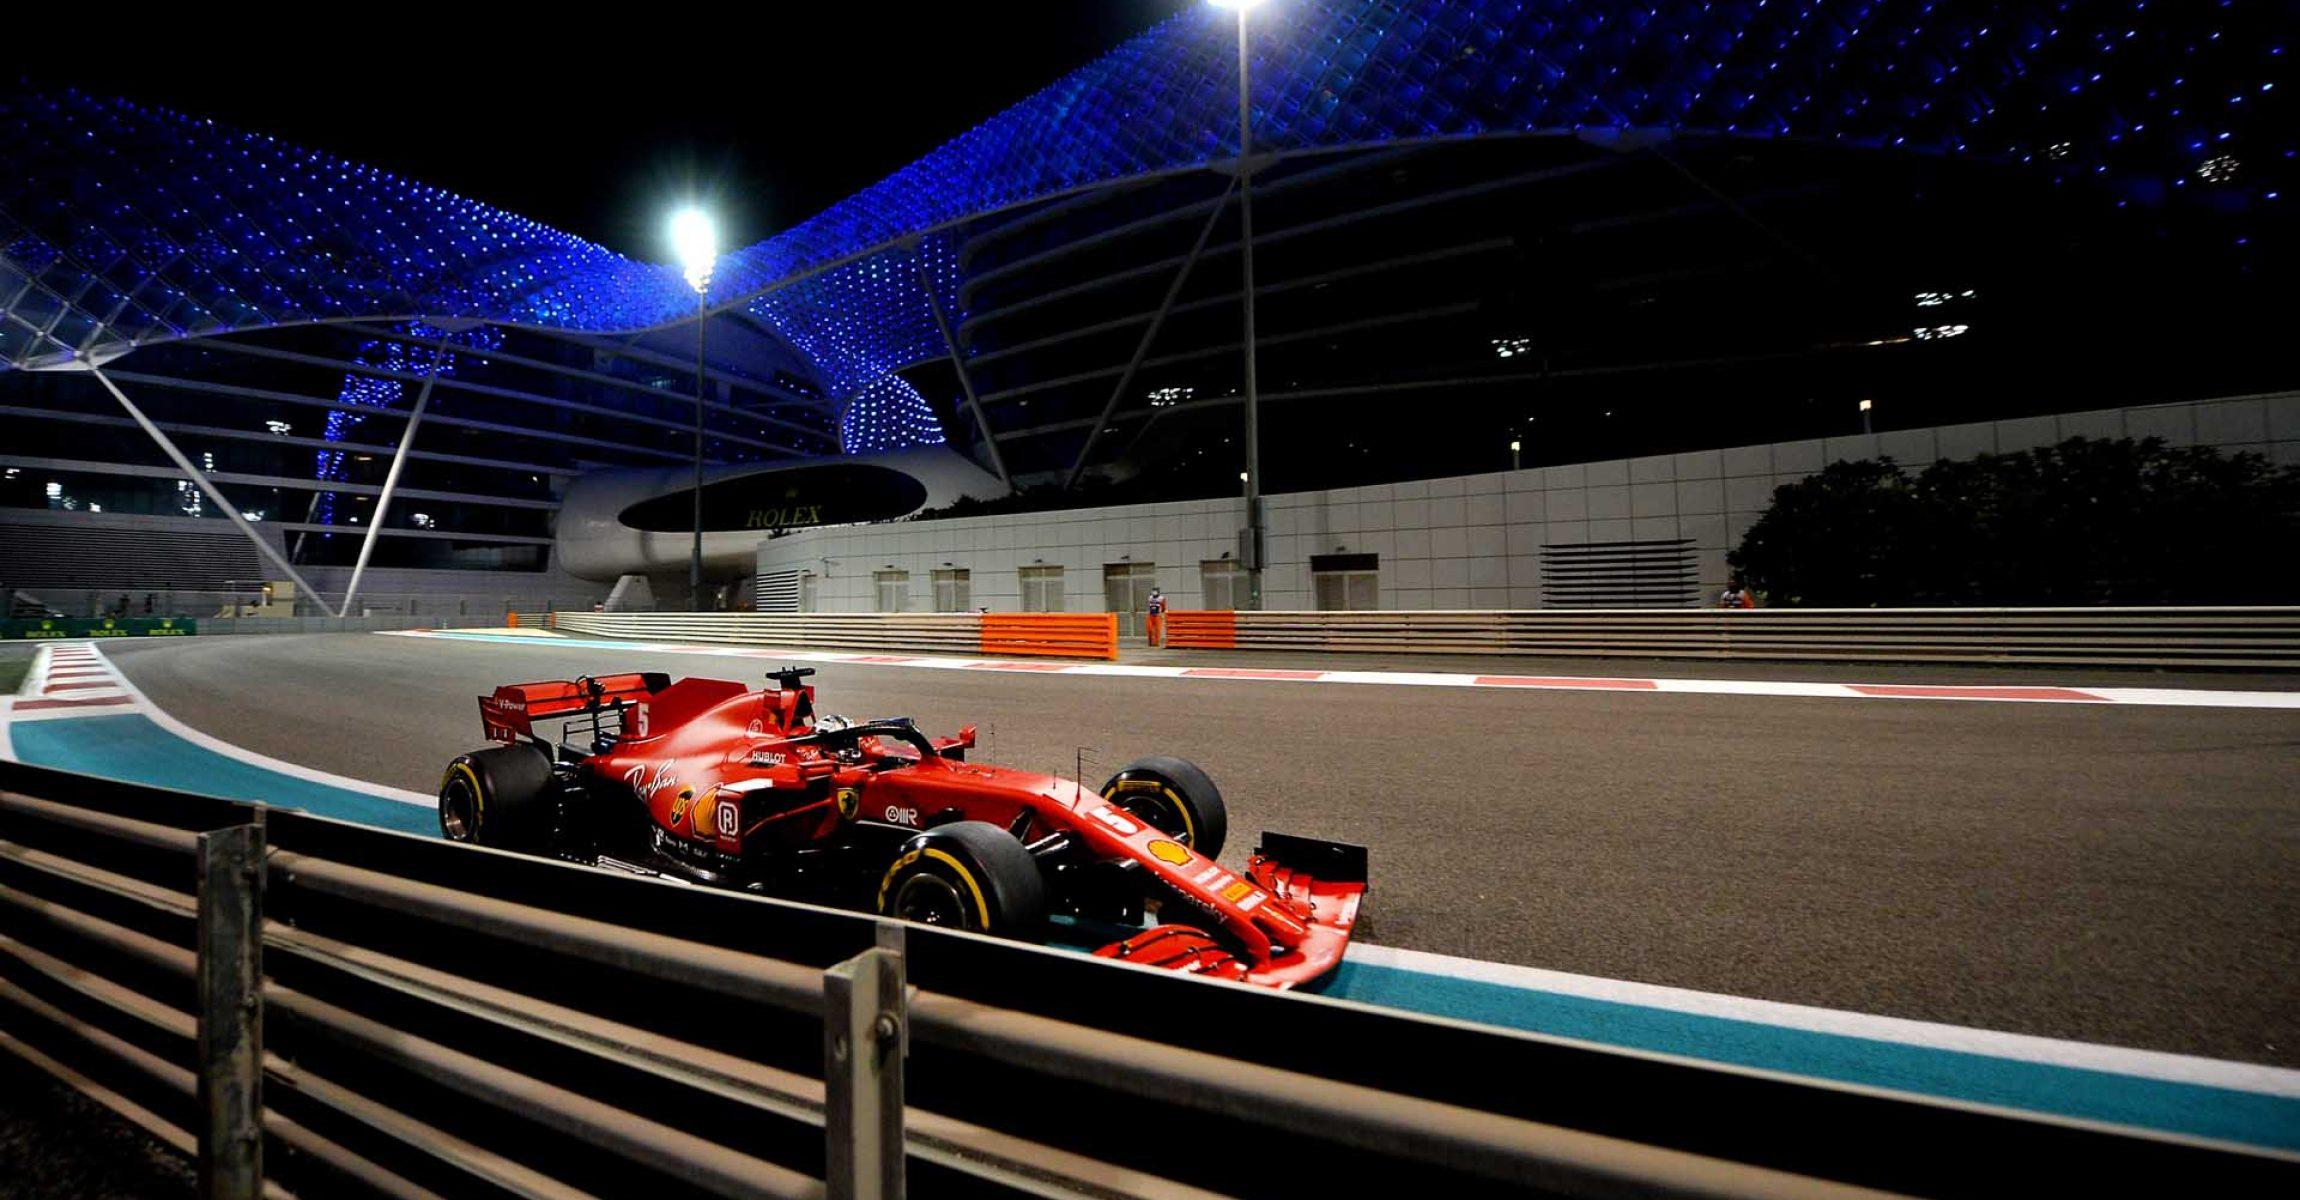 GP ABU DHABI  F1/2020 - DOMENICA  13/12/2020    credit: @Scuderia Ferrari Press Office Sebastian Vettel